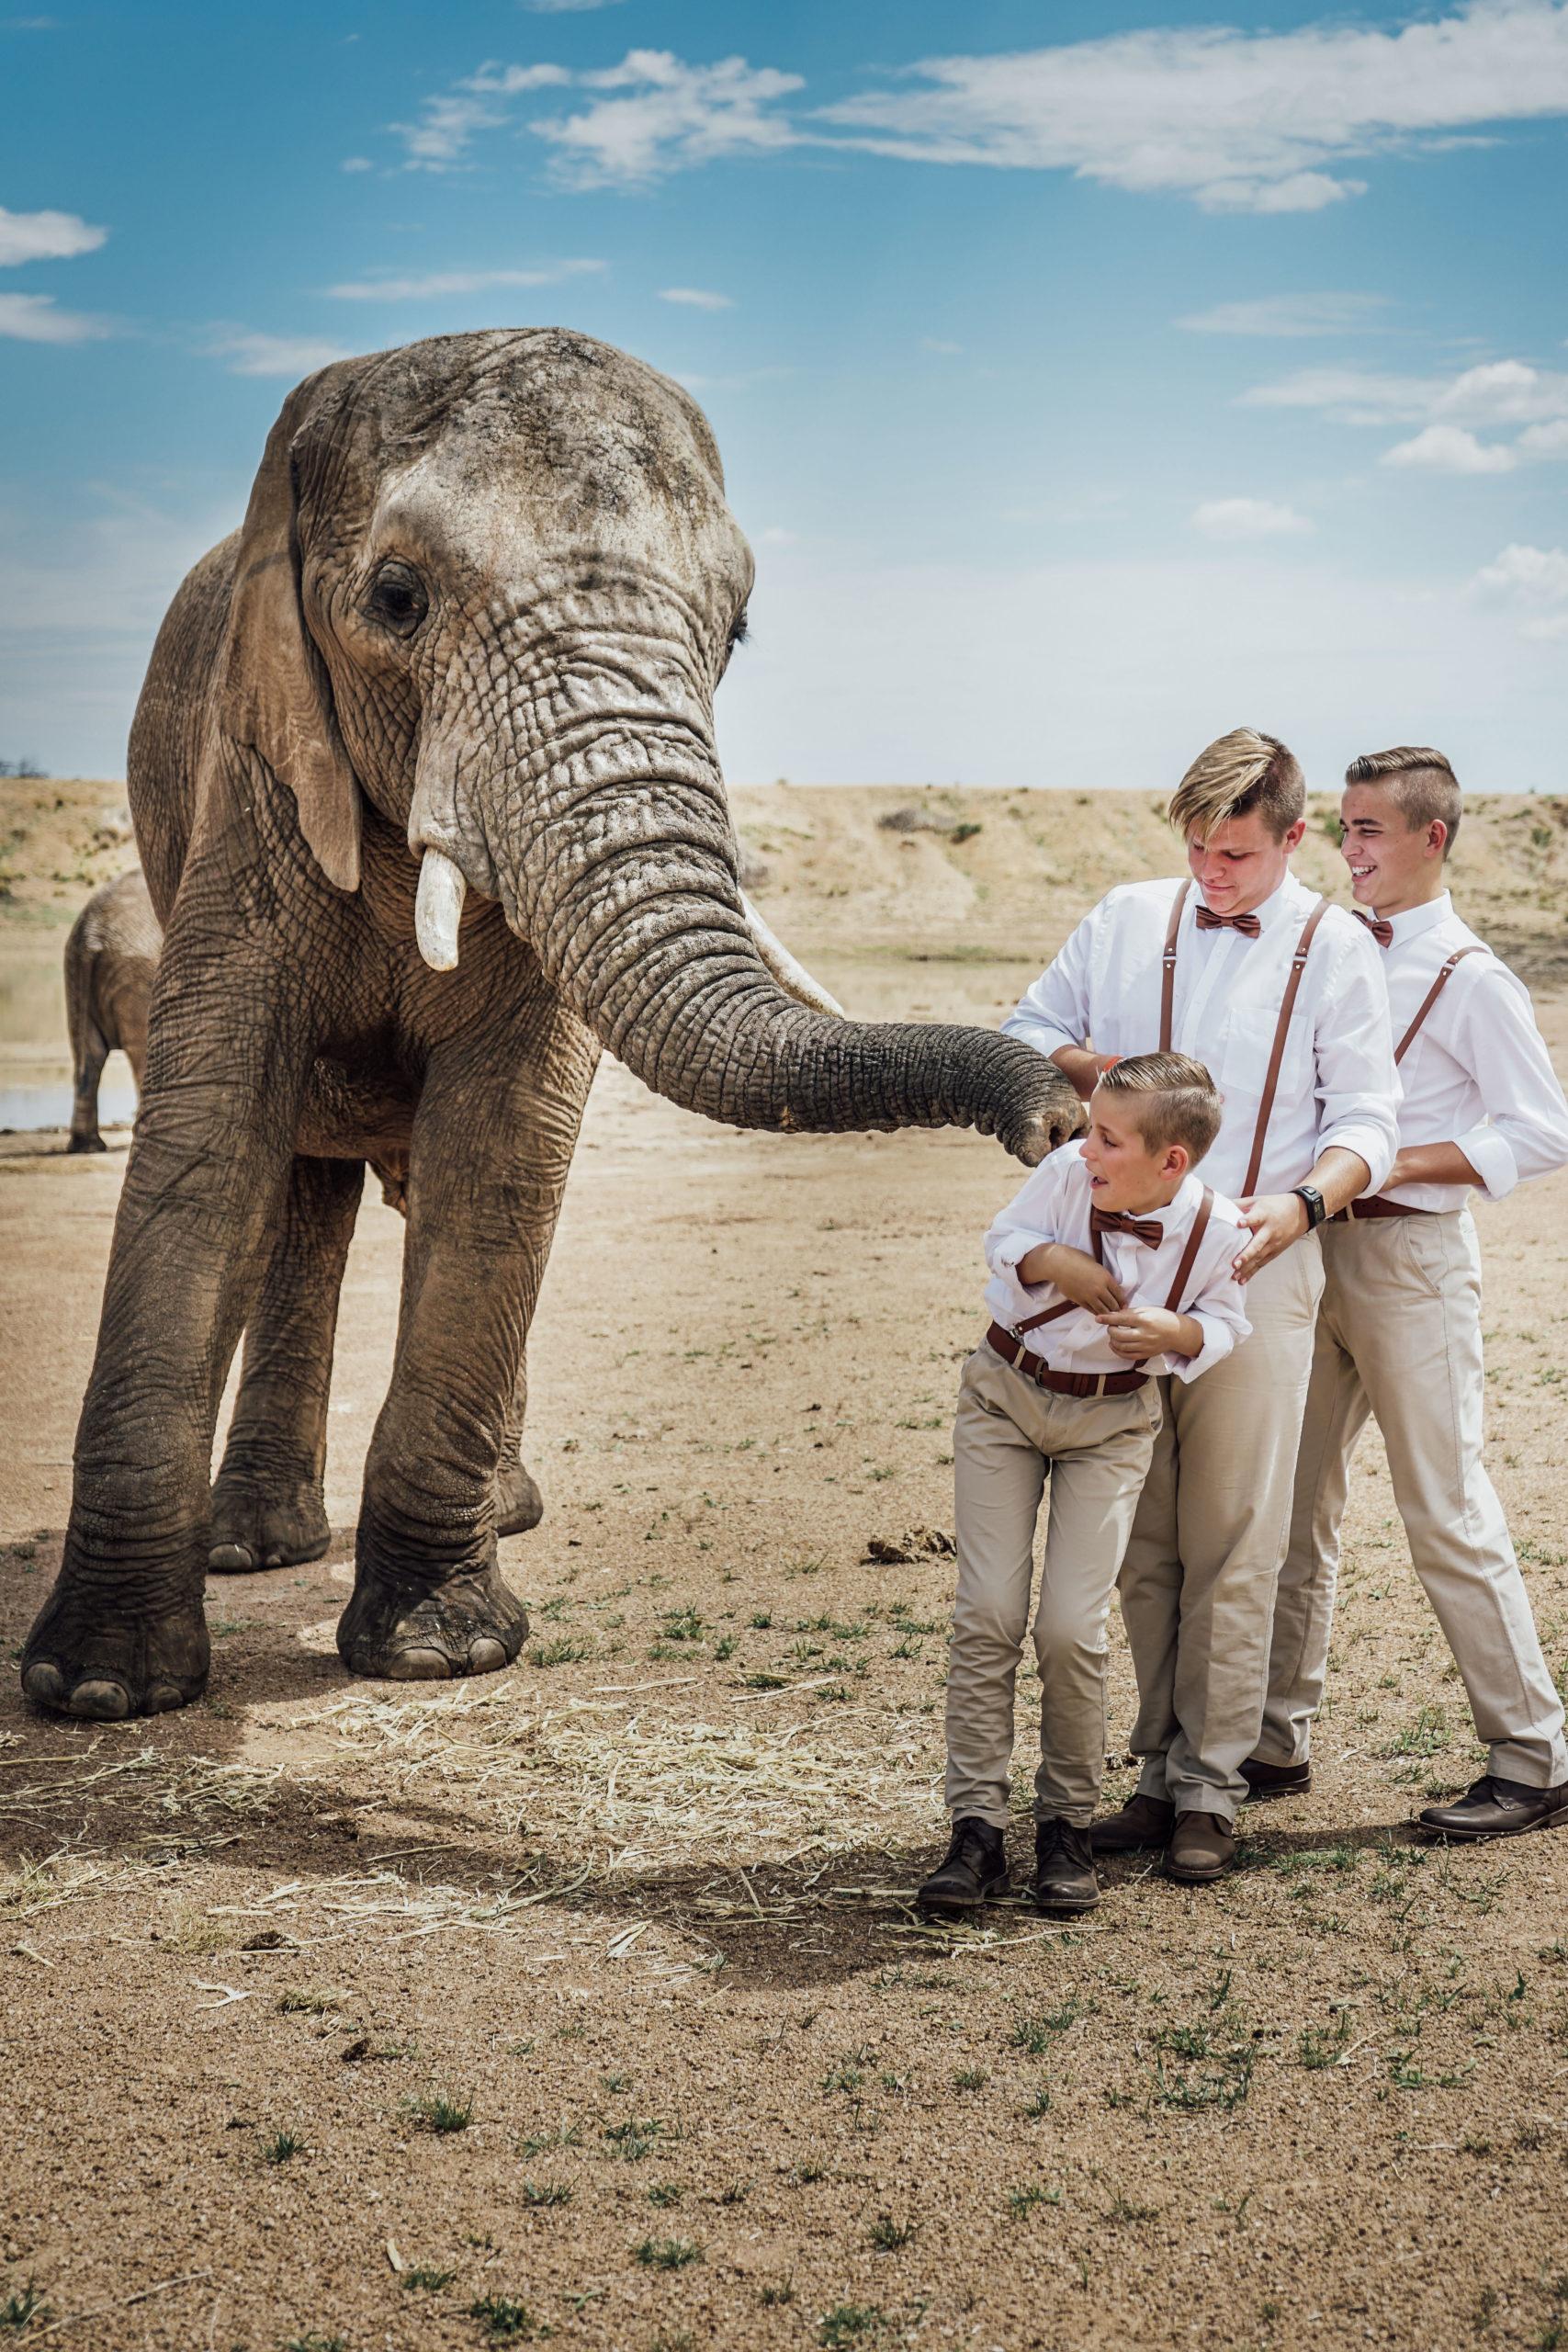 elephant-boys-dirt-fun